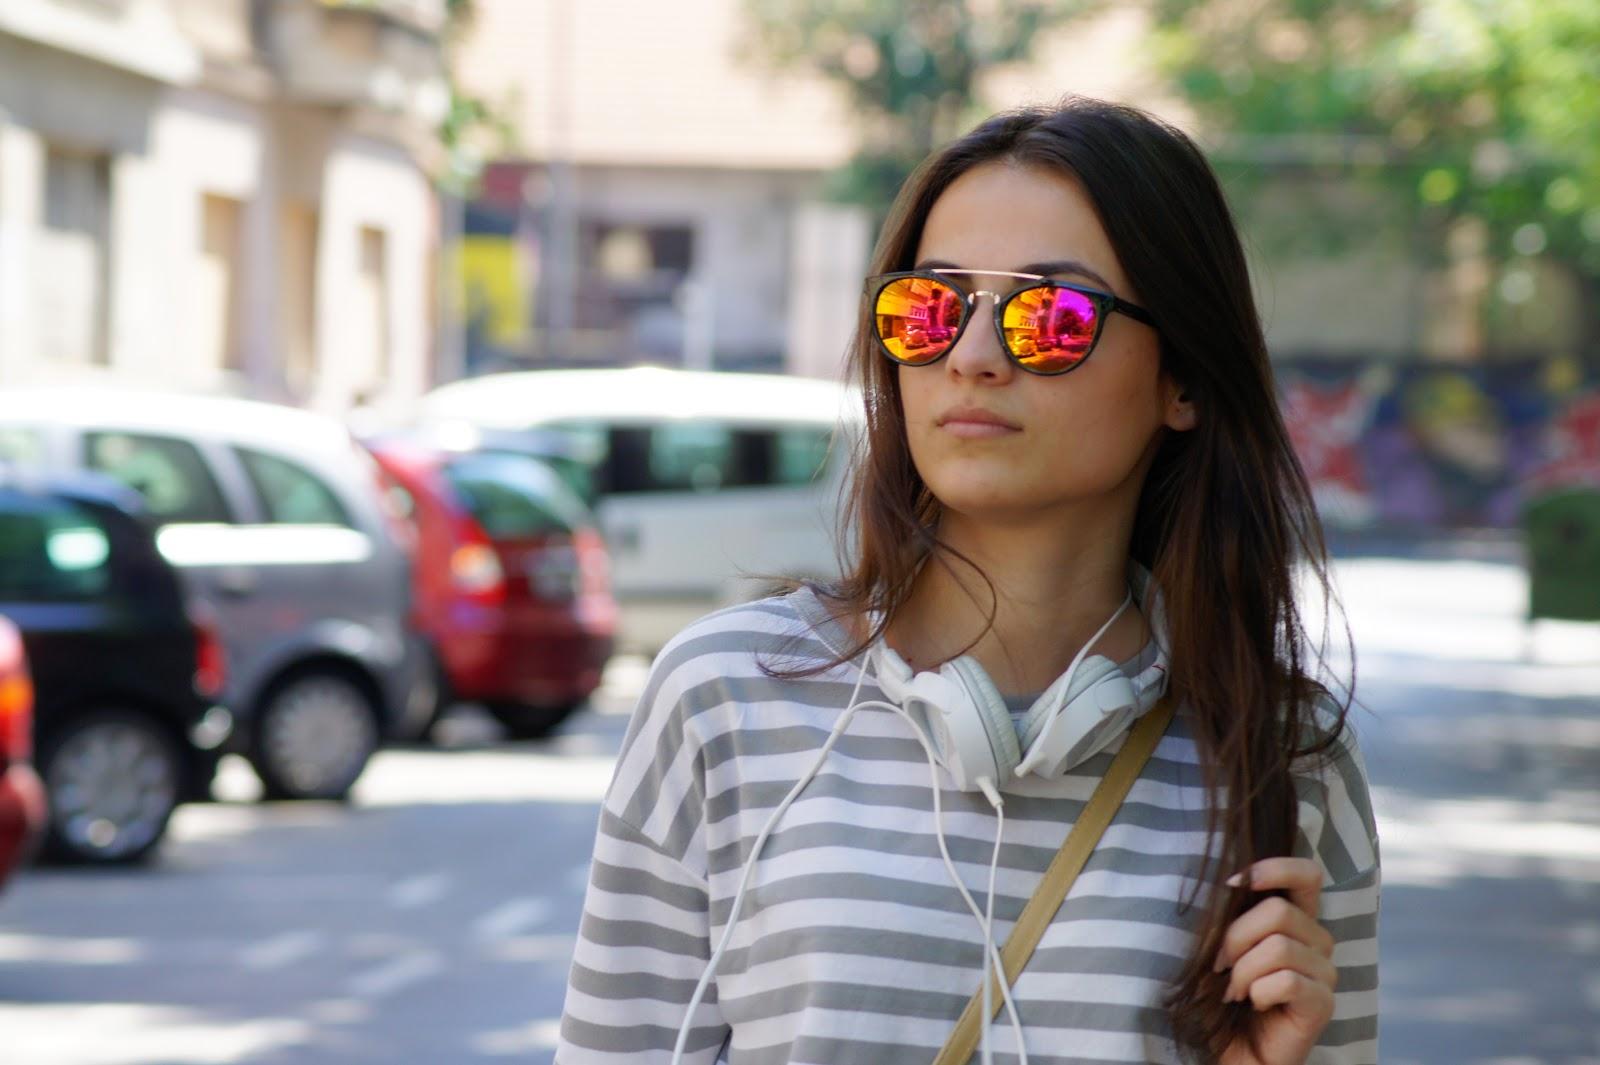 Fashiondose Blogspot & Emblem Eyewear Vintage Inspired Dapper Cross Bar Wayfarer Flash Revo Lens Sunglasses